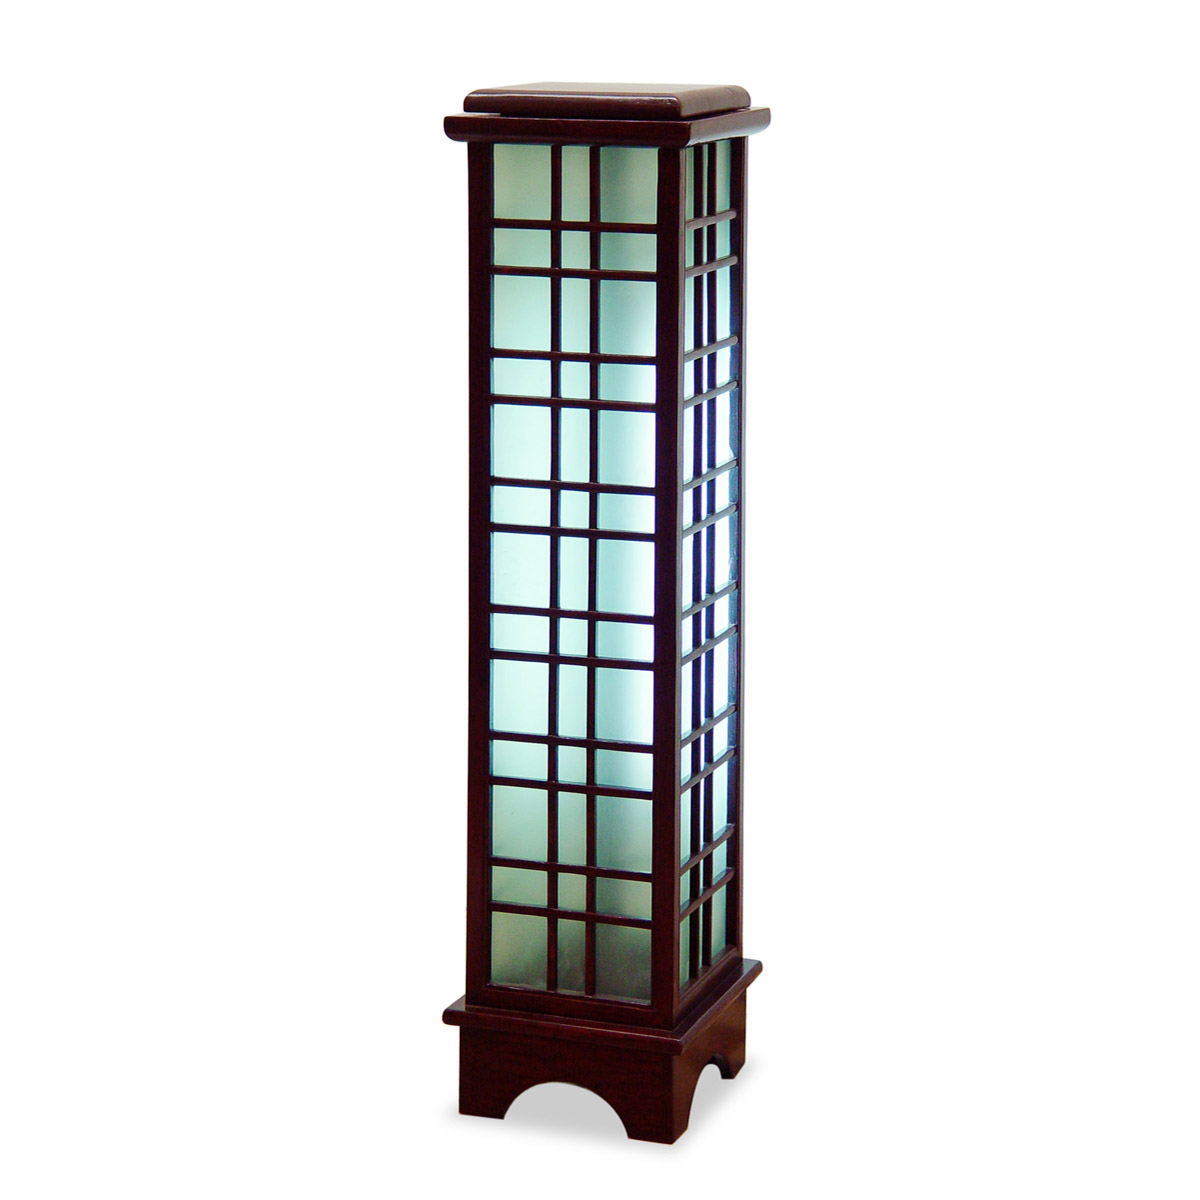 Comfortable Lighting With Japanese Floor Lamps Warisan